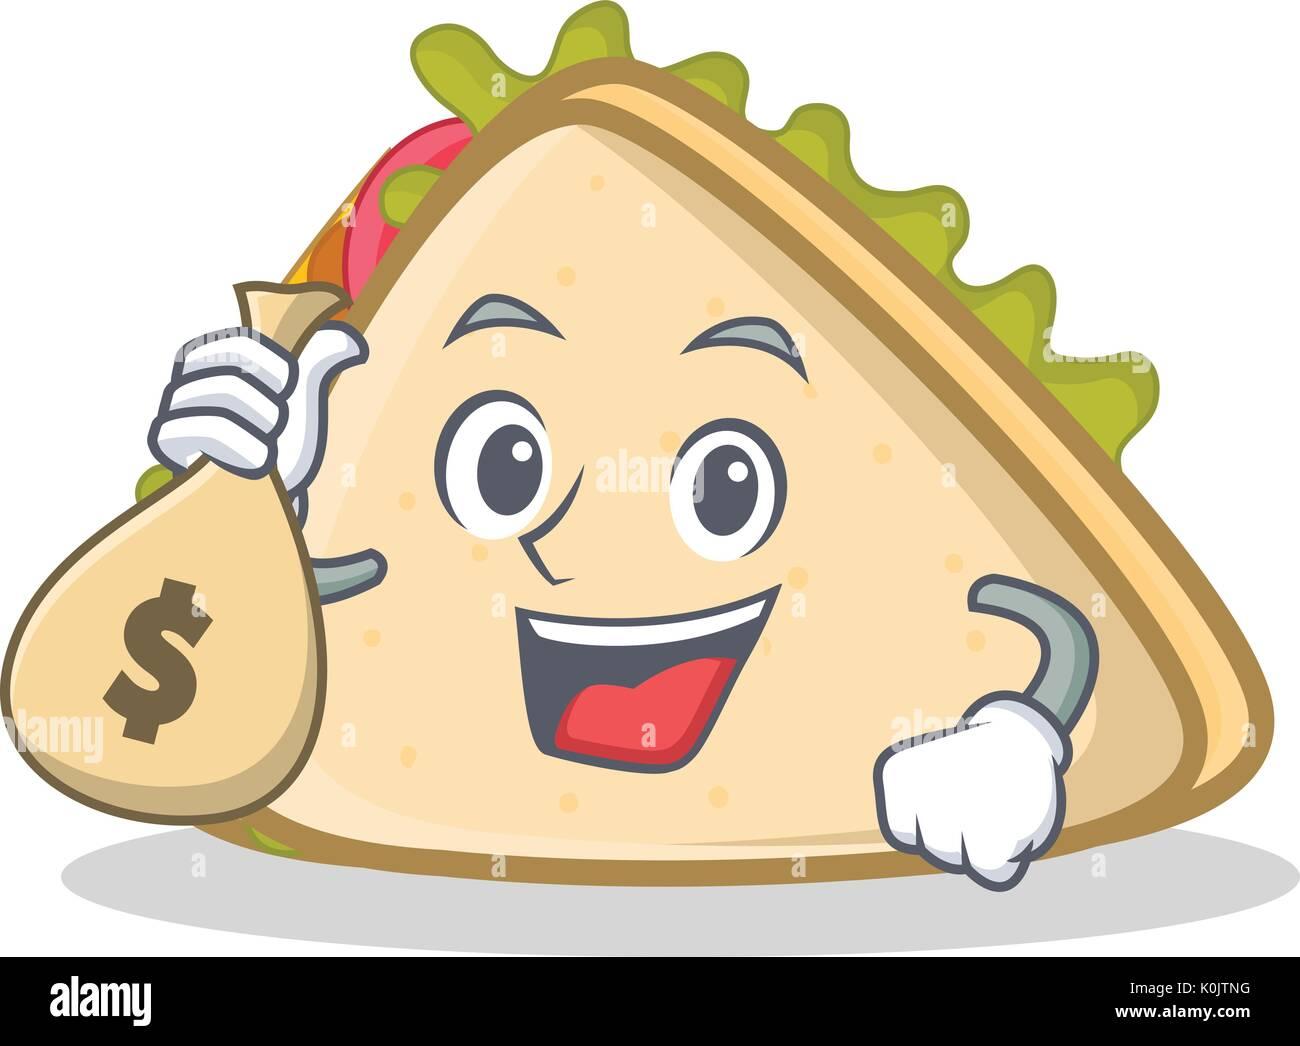 with money bag sandwich character cartoon style stock vector image art alamy https www alamy com with money bag sandwich character cartoon style image155307868 html